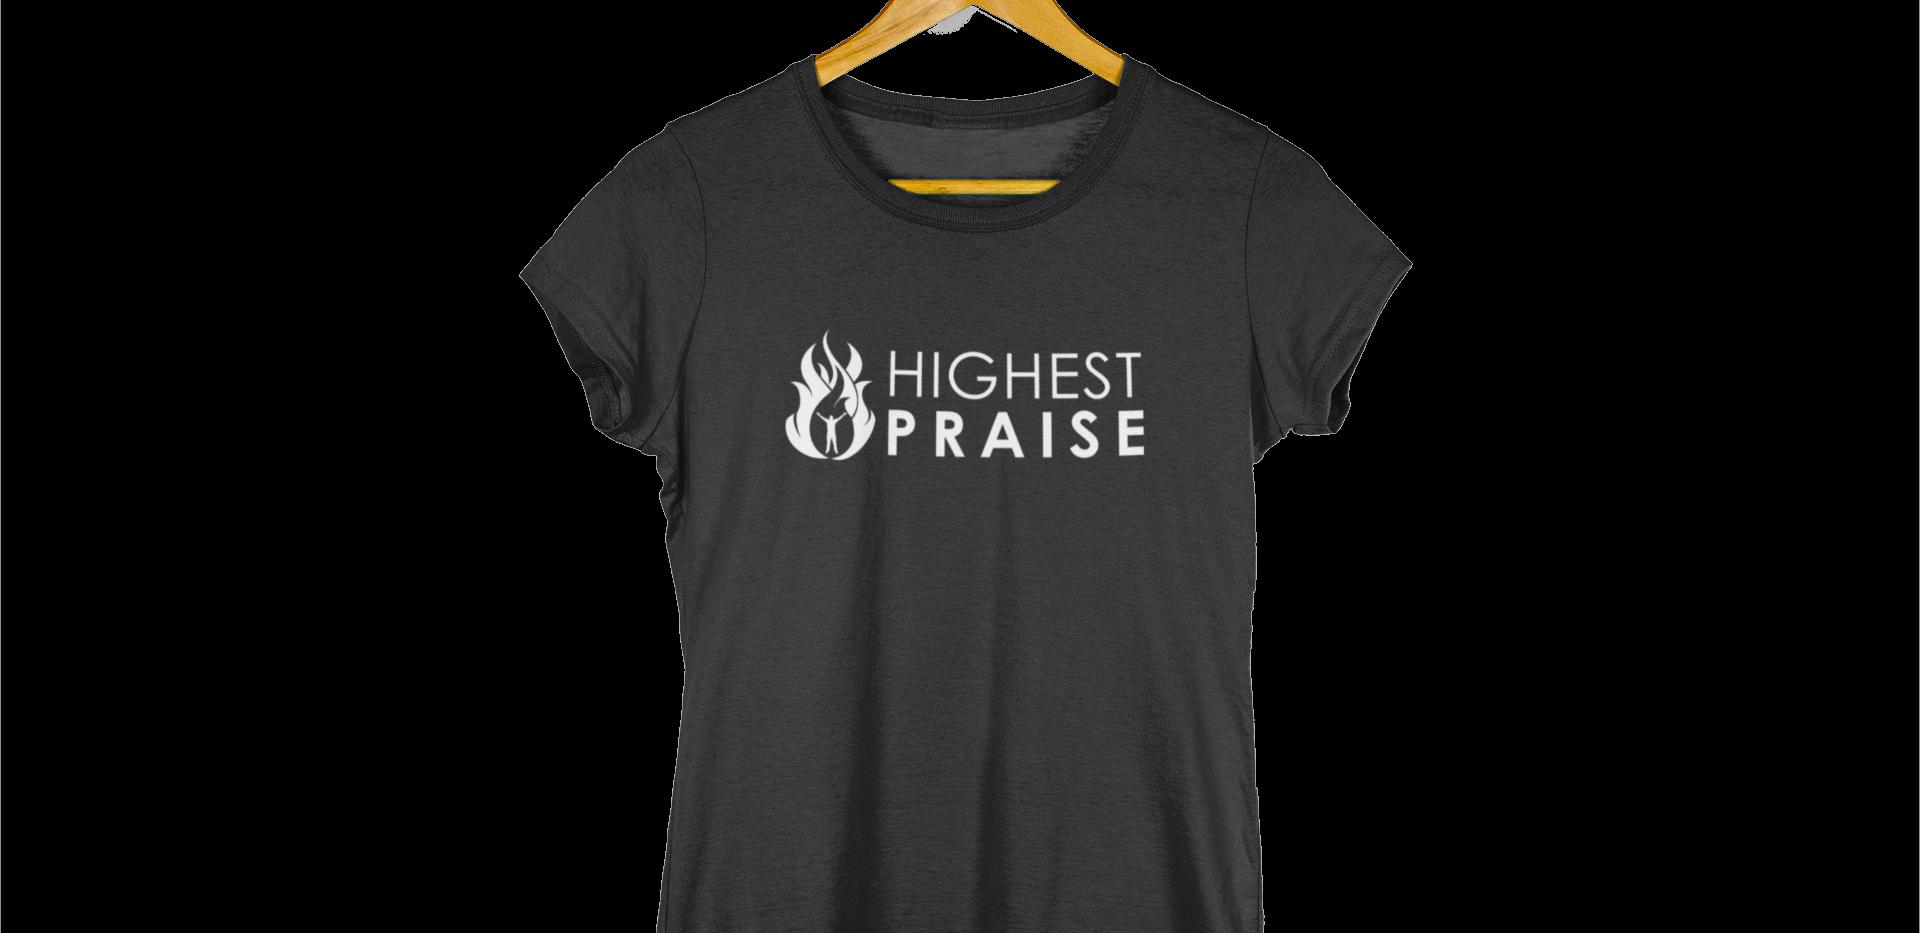 HP t-shirt